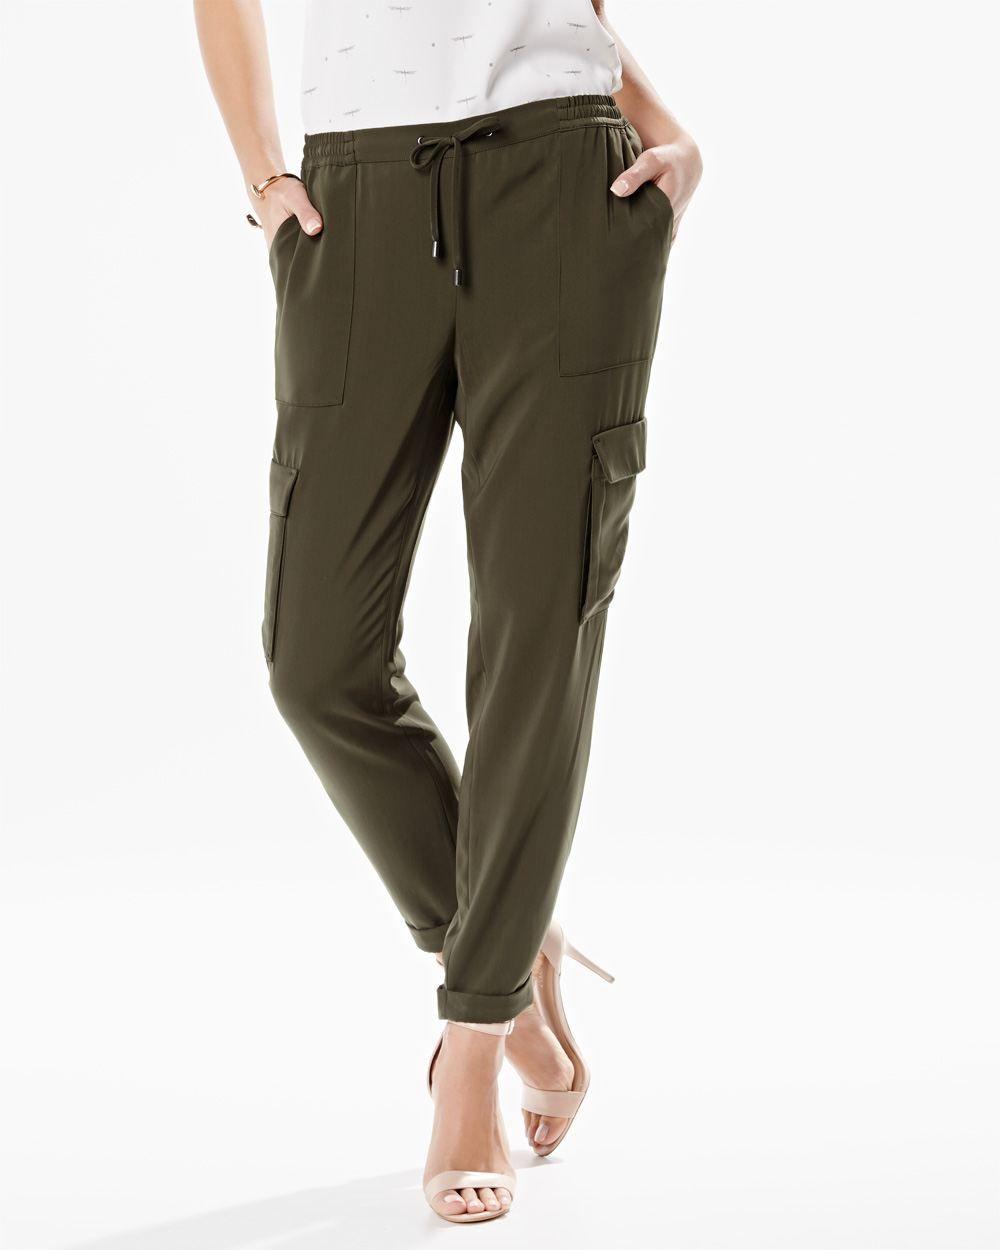 Pin By Trending Sf On Pants Pants Cargo Pants Skirt Pants